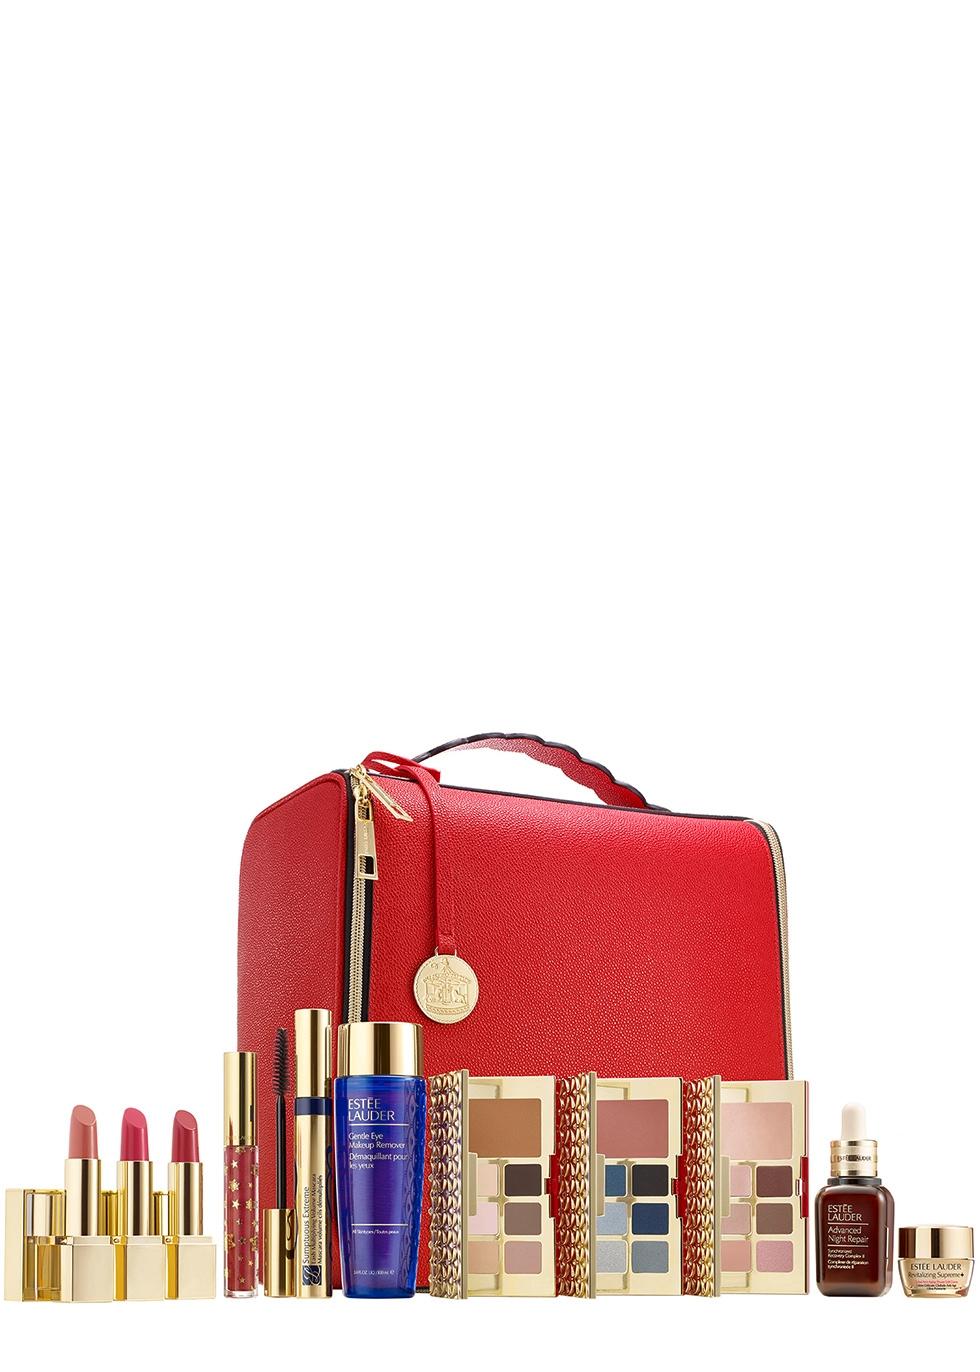 Estée Lauder Blockbuster Set - no fragrance purchase required £68 C+C @ Harvey Nichols (Home Delivery £6)